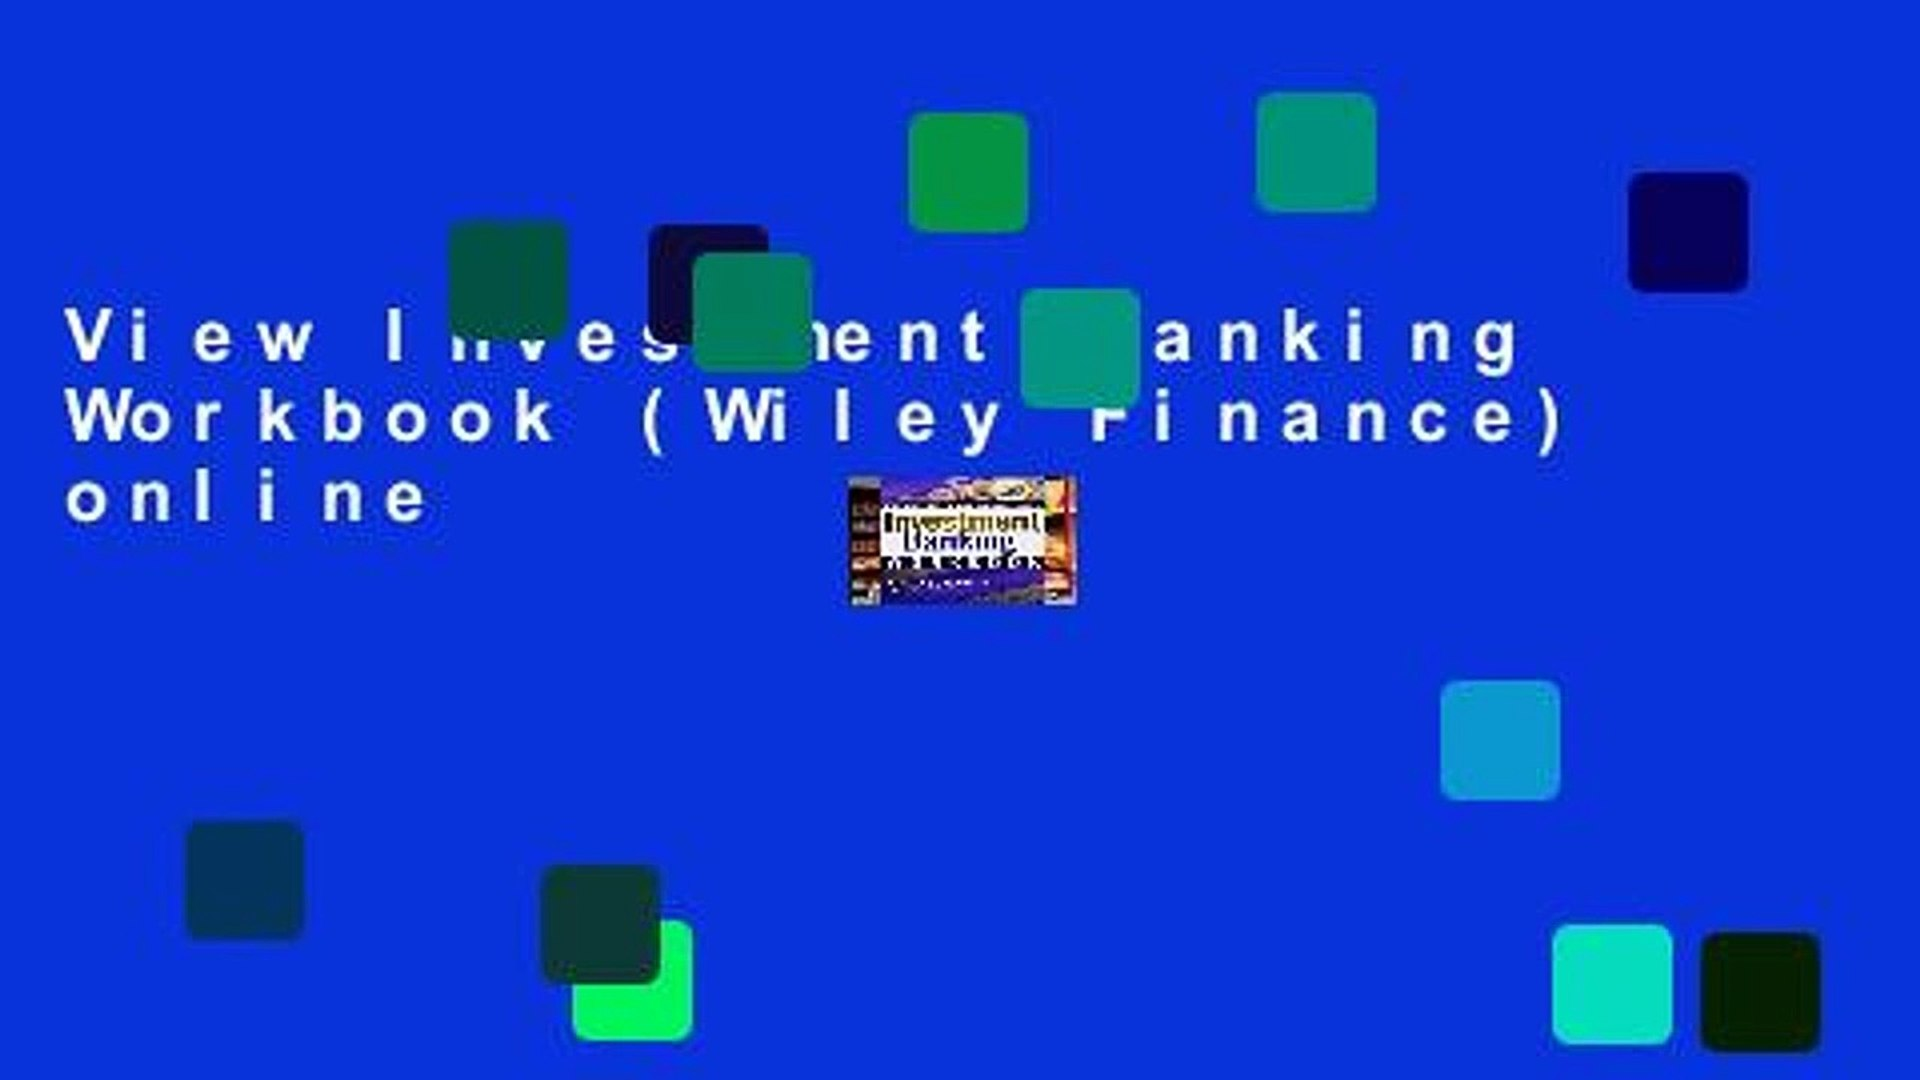 View Investment Banking Workbook (Wiley Finance) online